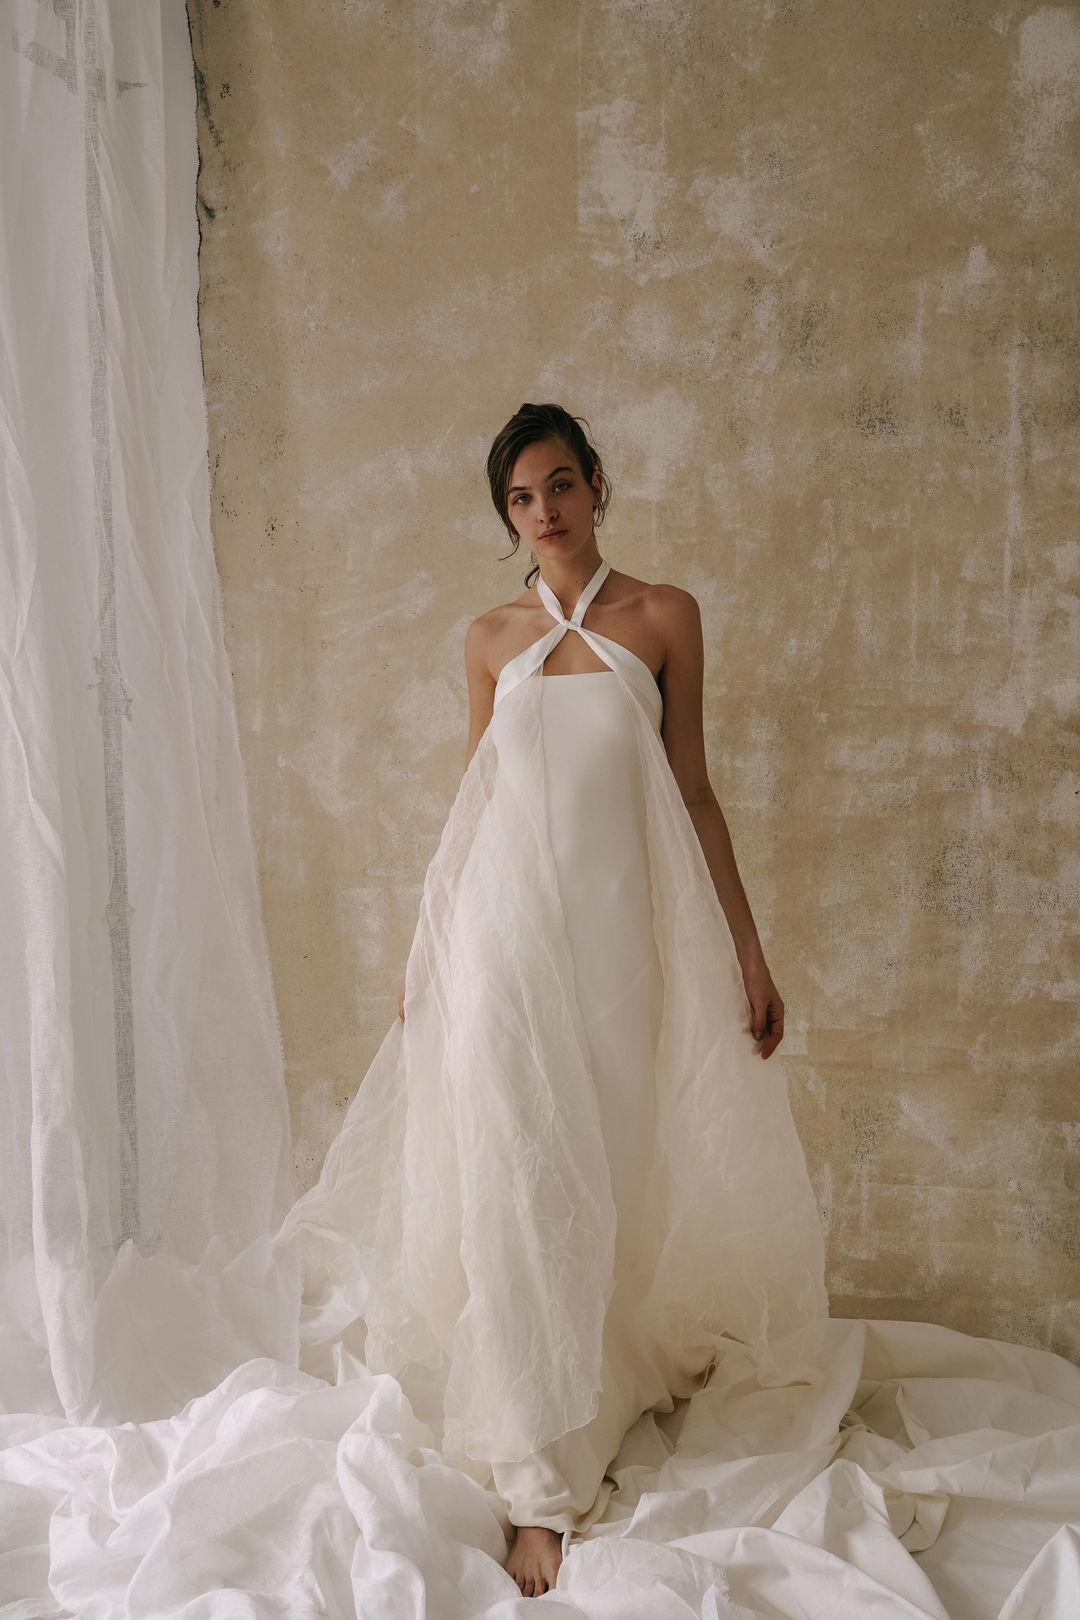 pirouette over skirt/dress dress photo